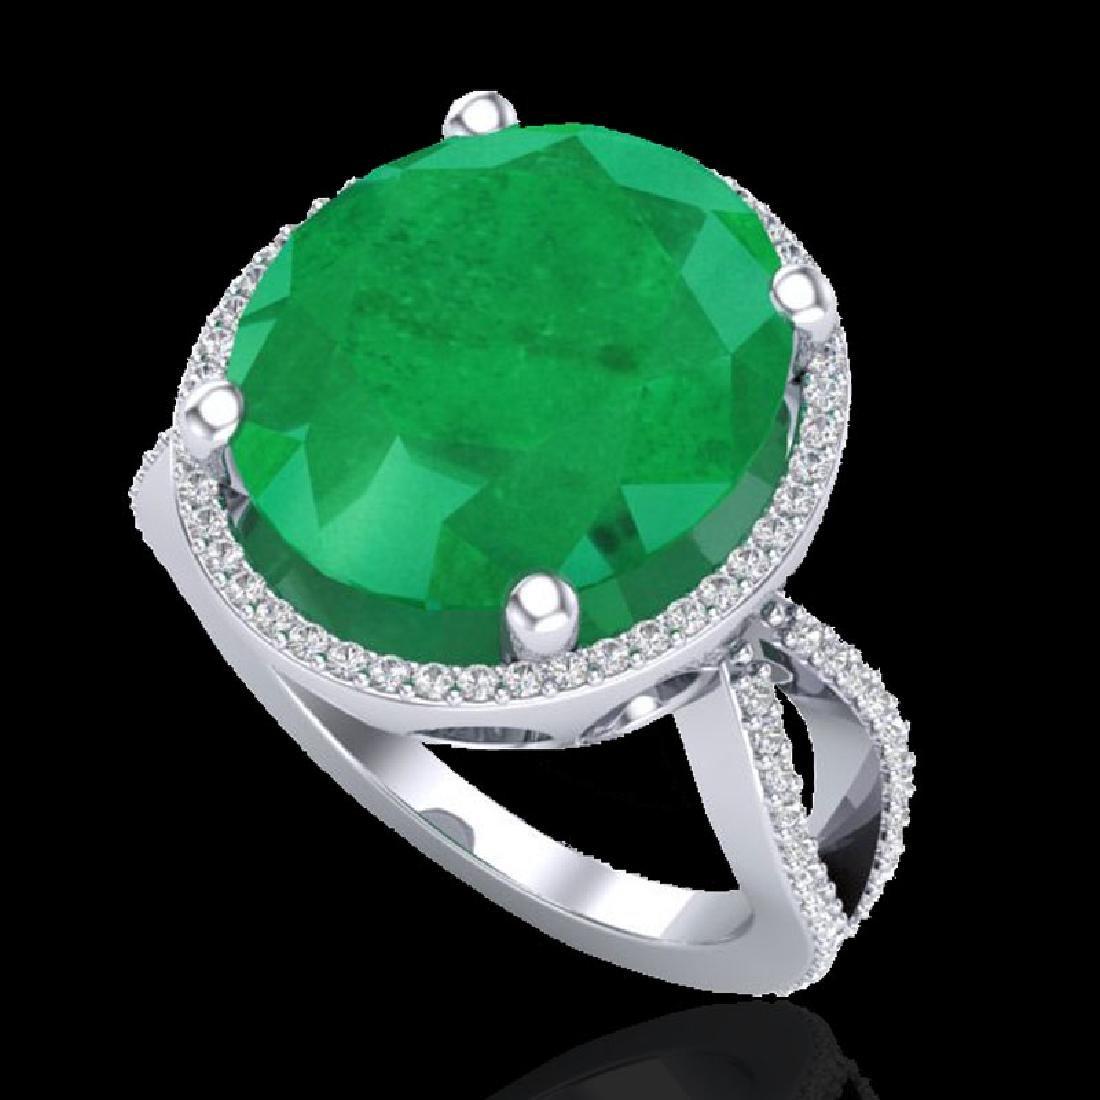 12 CTW Emerald & Micro Pave VS/SI Diamond Halo Ring 18K - 2